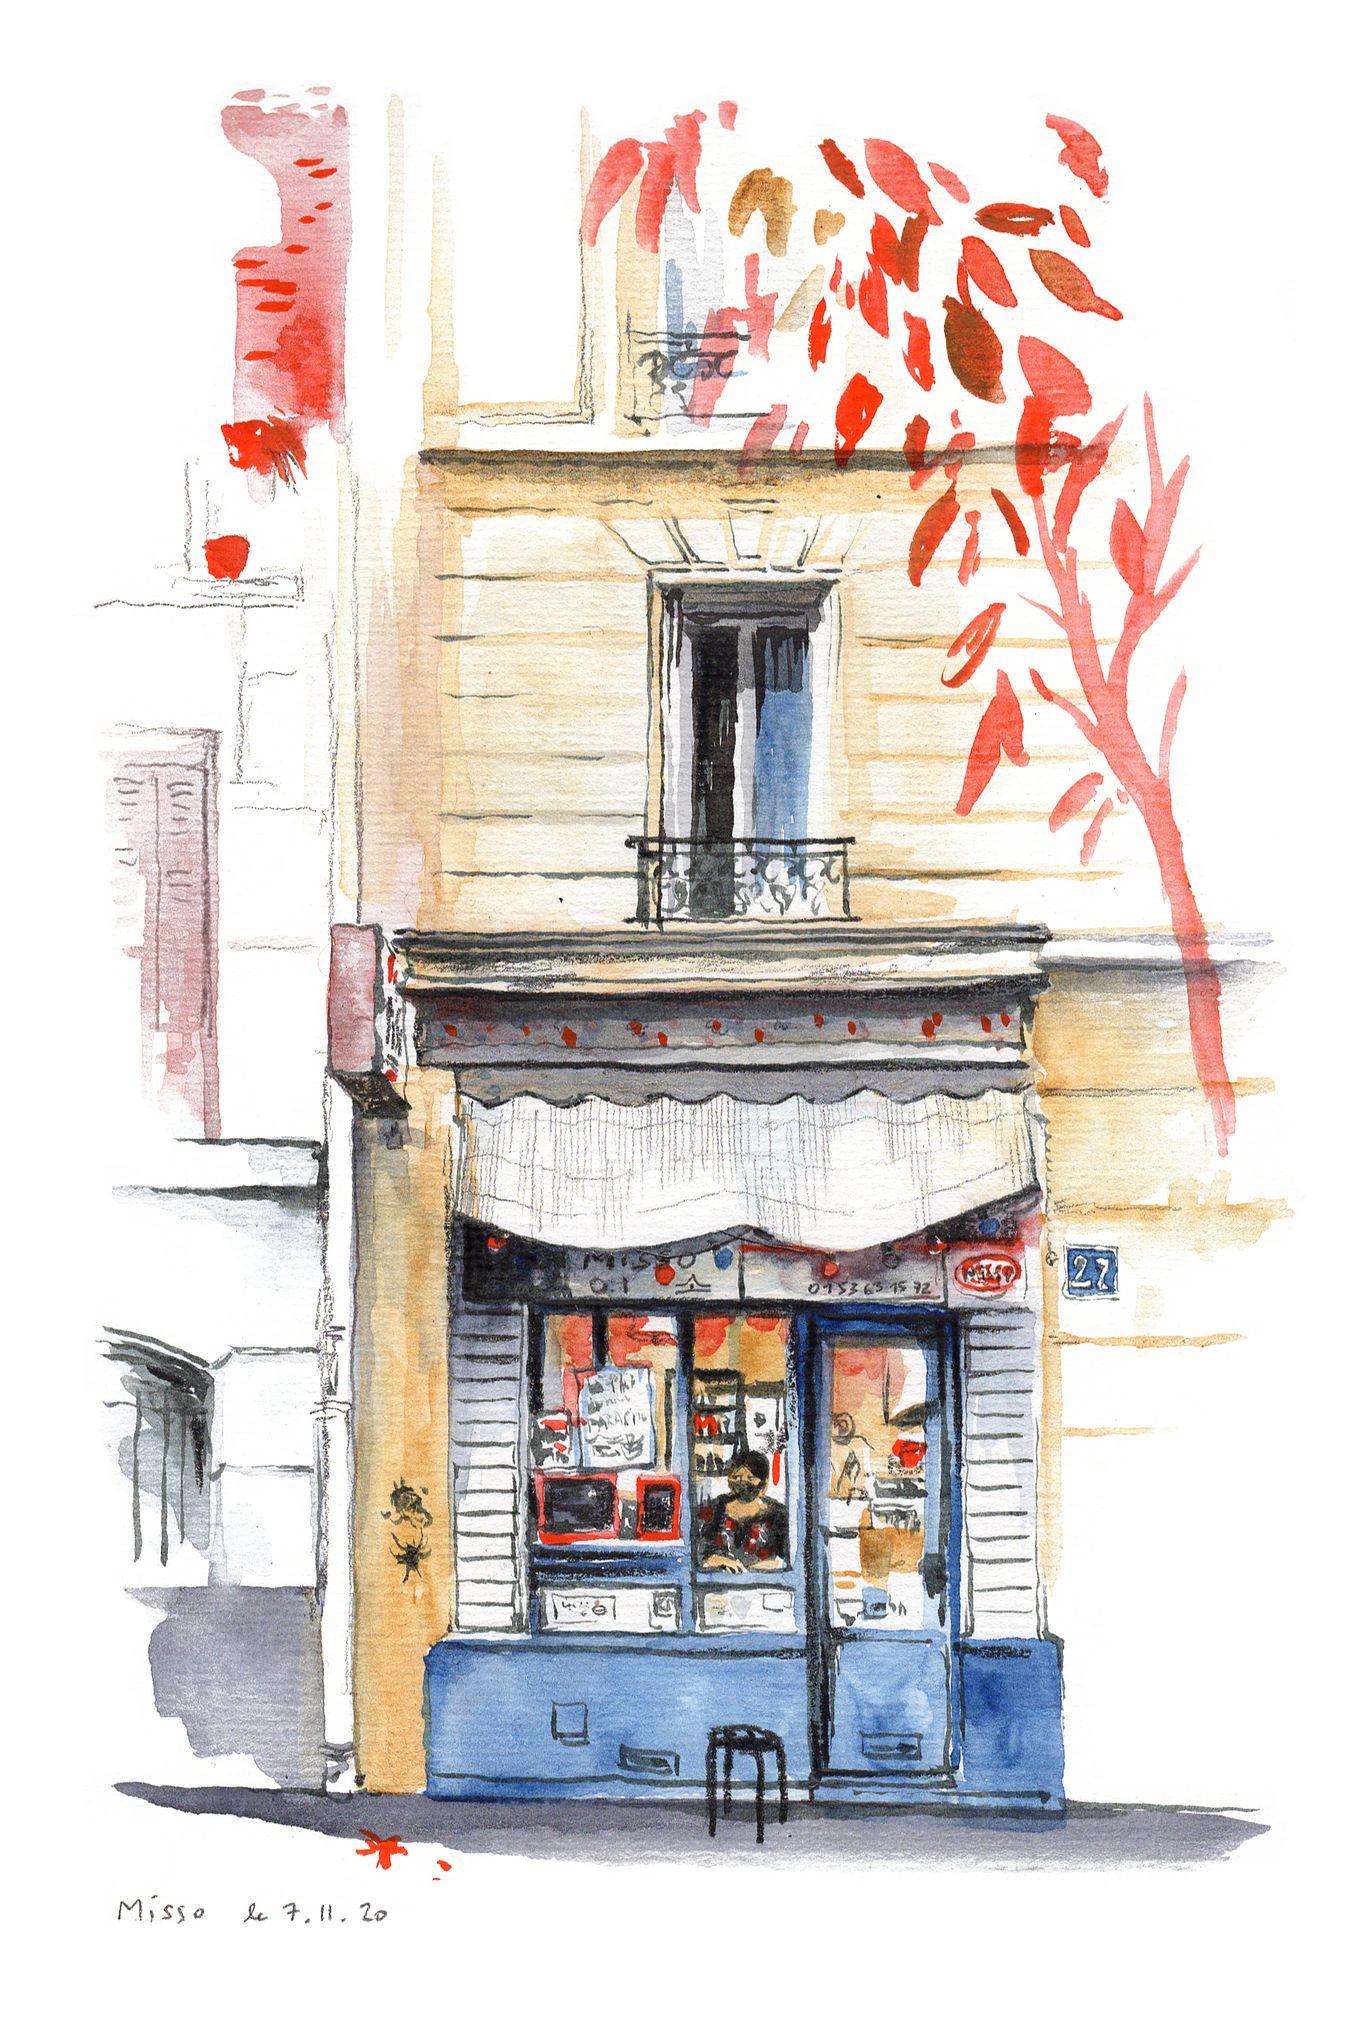 garance-illustration-Marielle-Durand-Misso